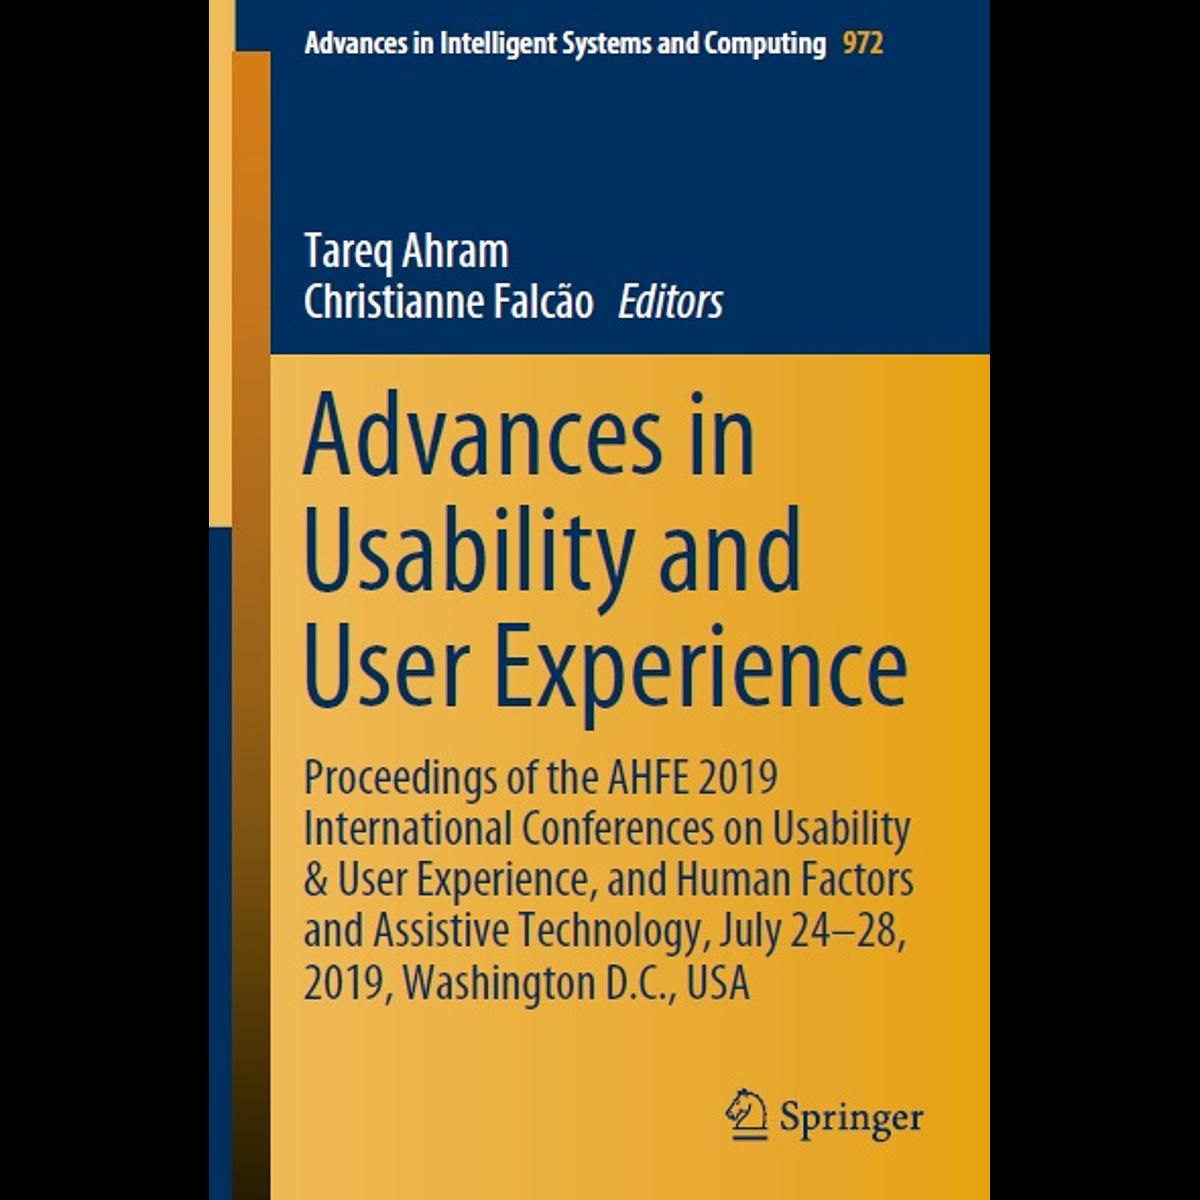 Advances in Usability and User Experience – книга о полезности иммерсивных технологий.